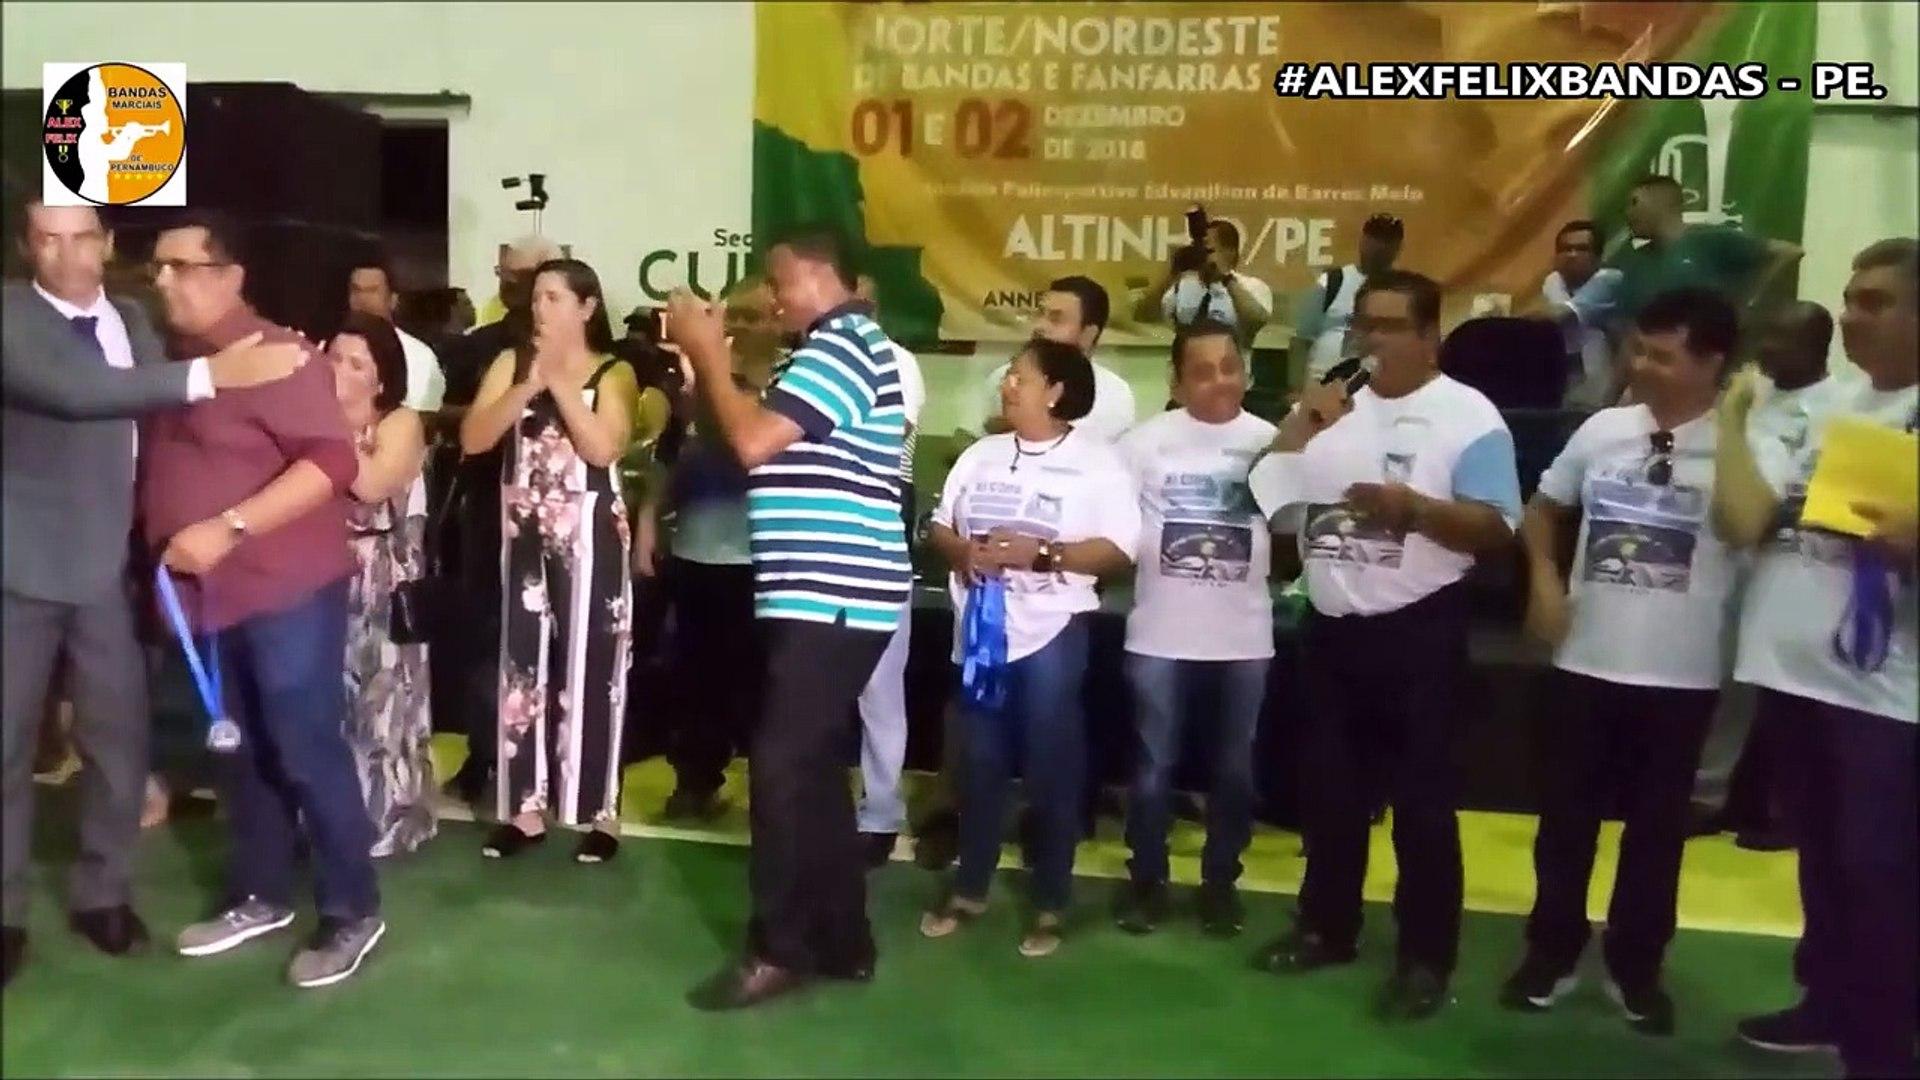 RESULTADO BANDA MARCIAL MASTER 2018 - XI COPA NORDESTE NORTE DE BANDAS E FANFARRAS - ALTINHO - PE